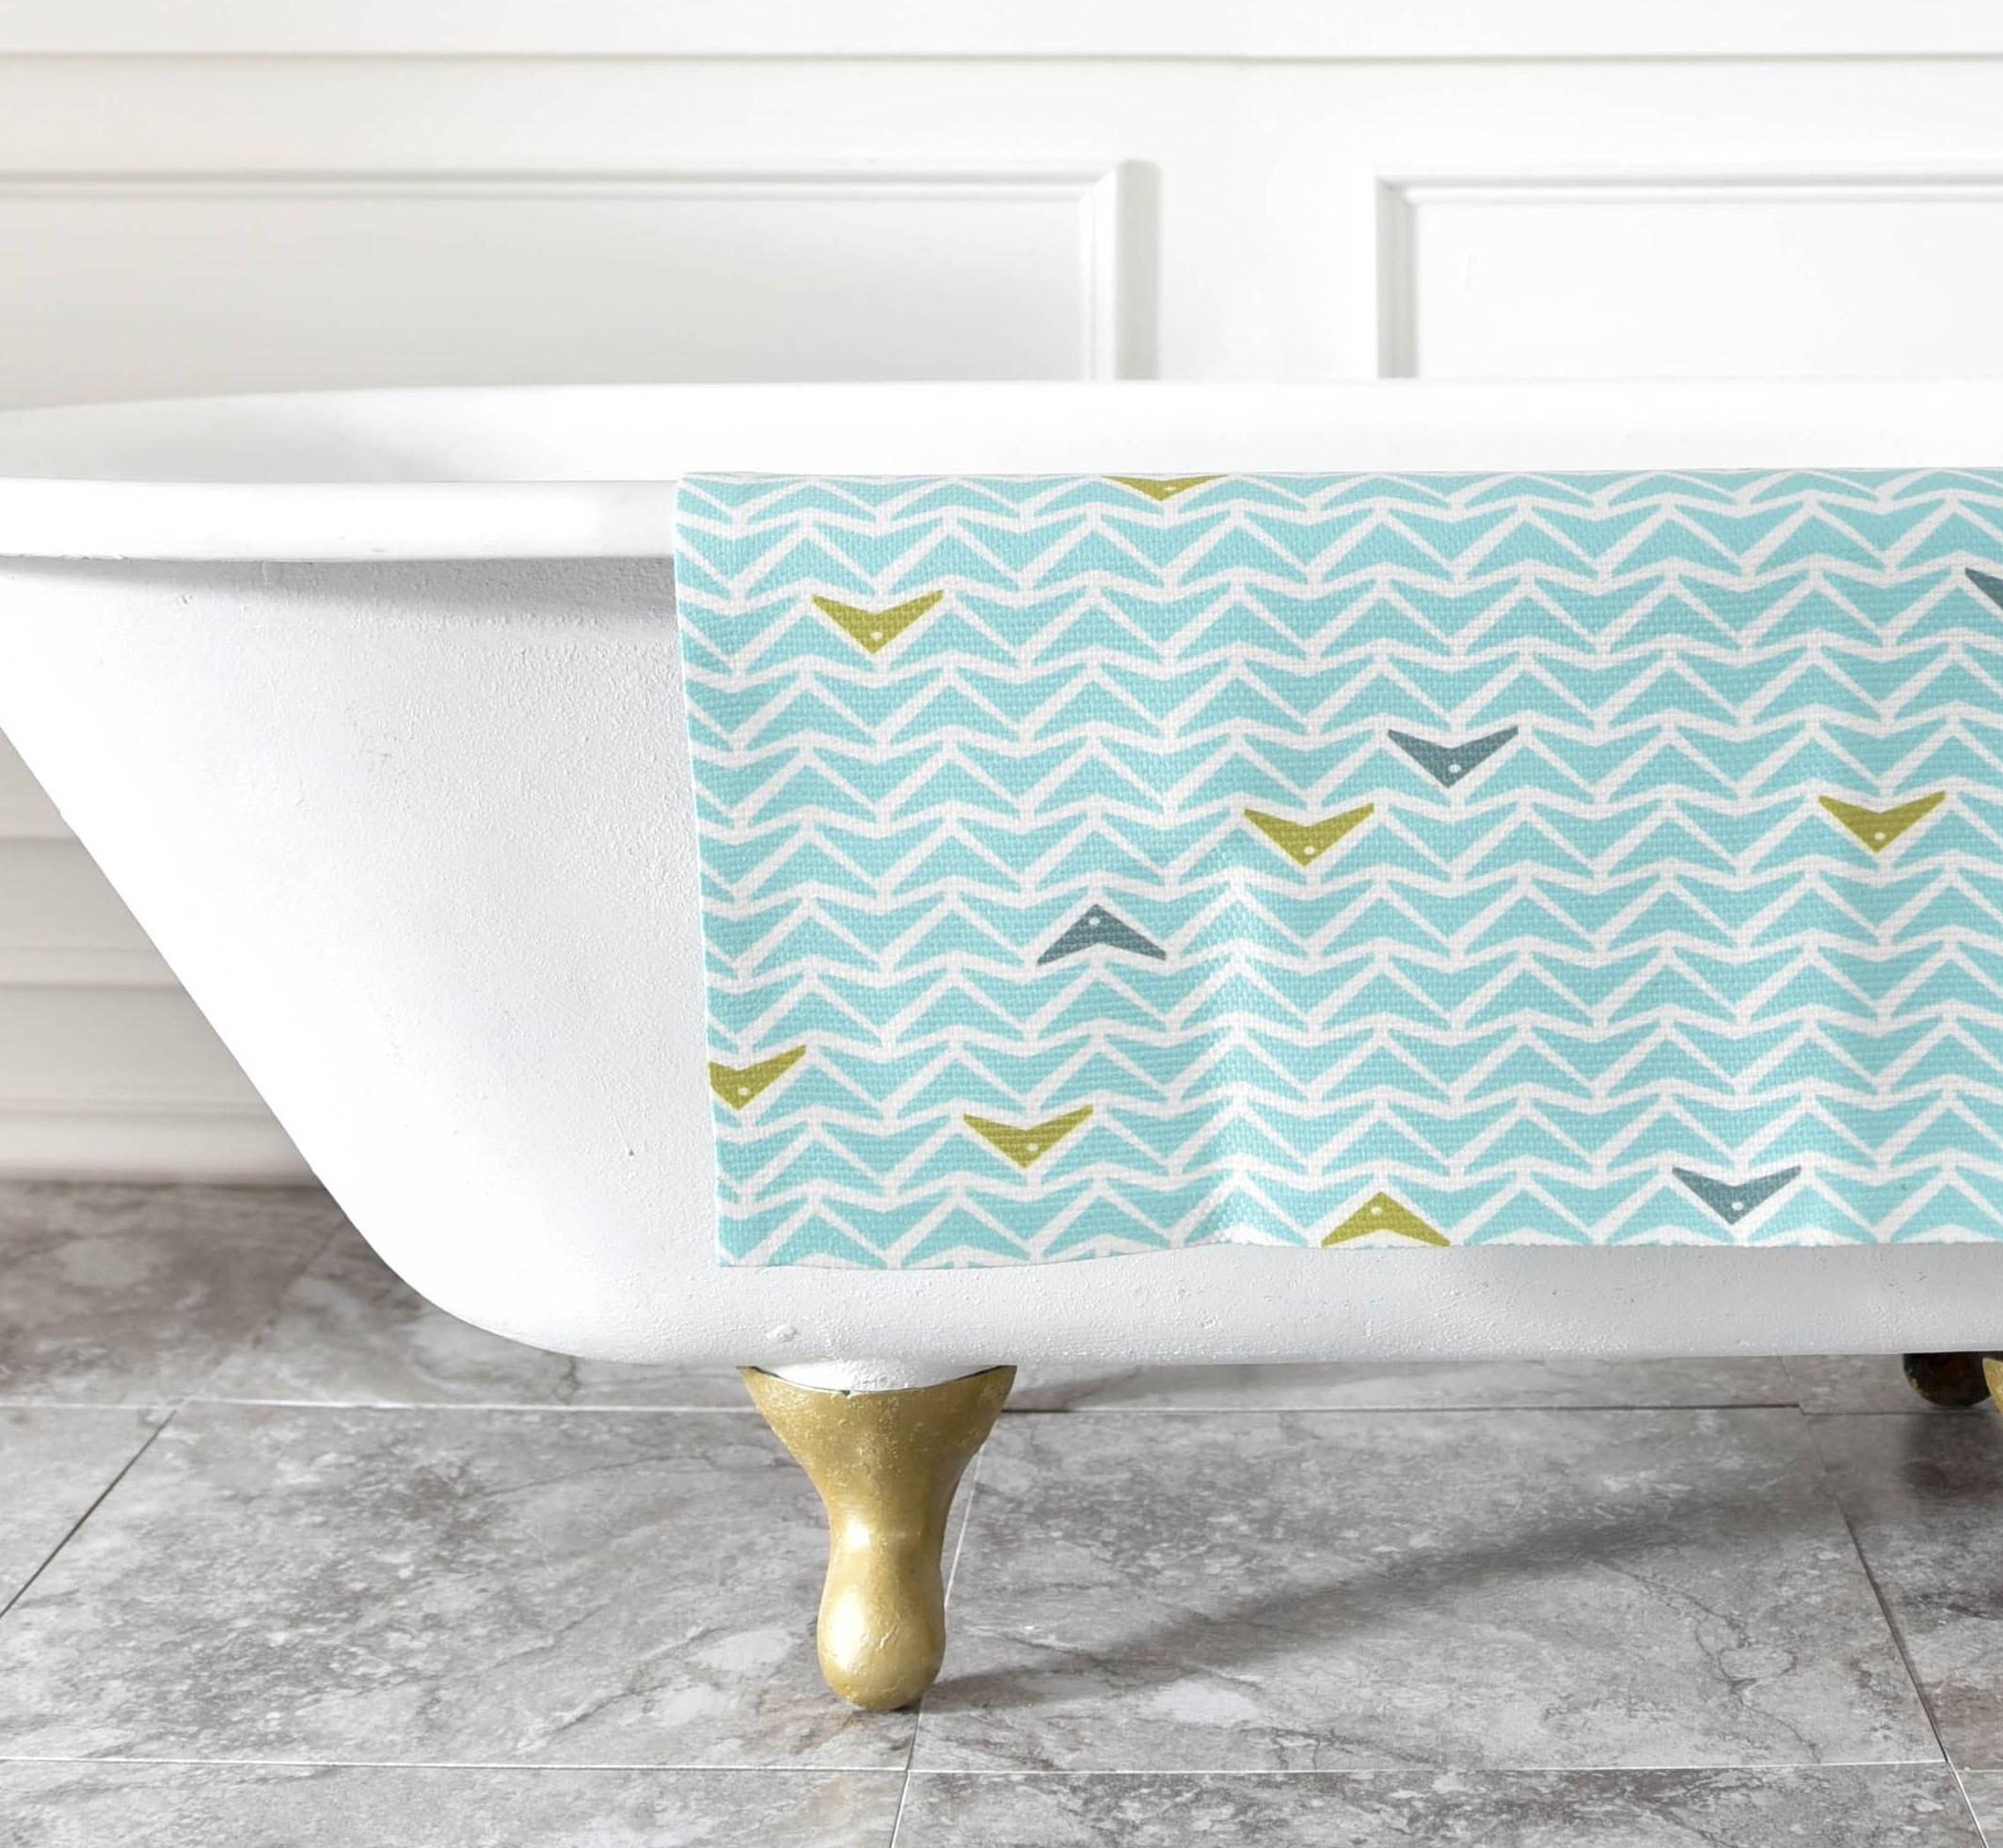 This bright decorative bathroom rug